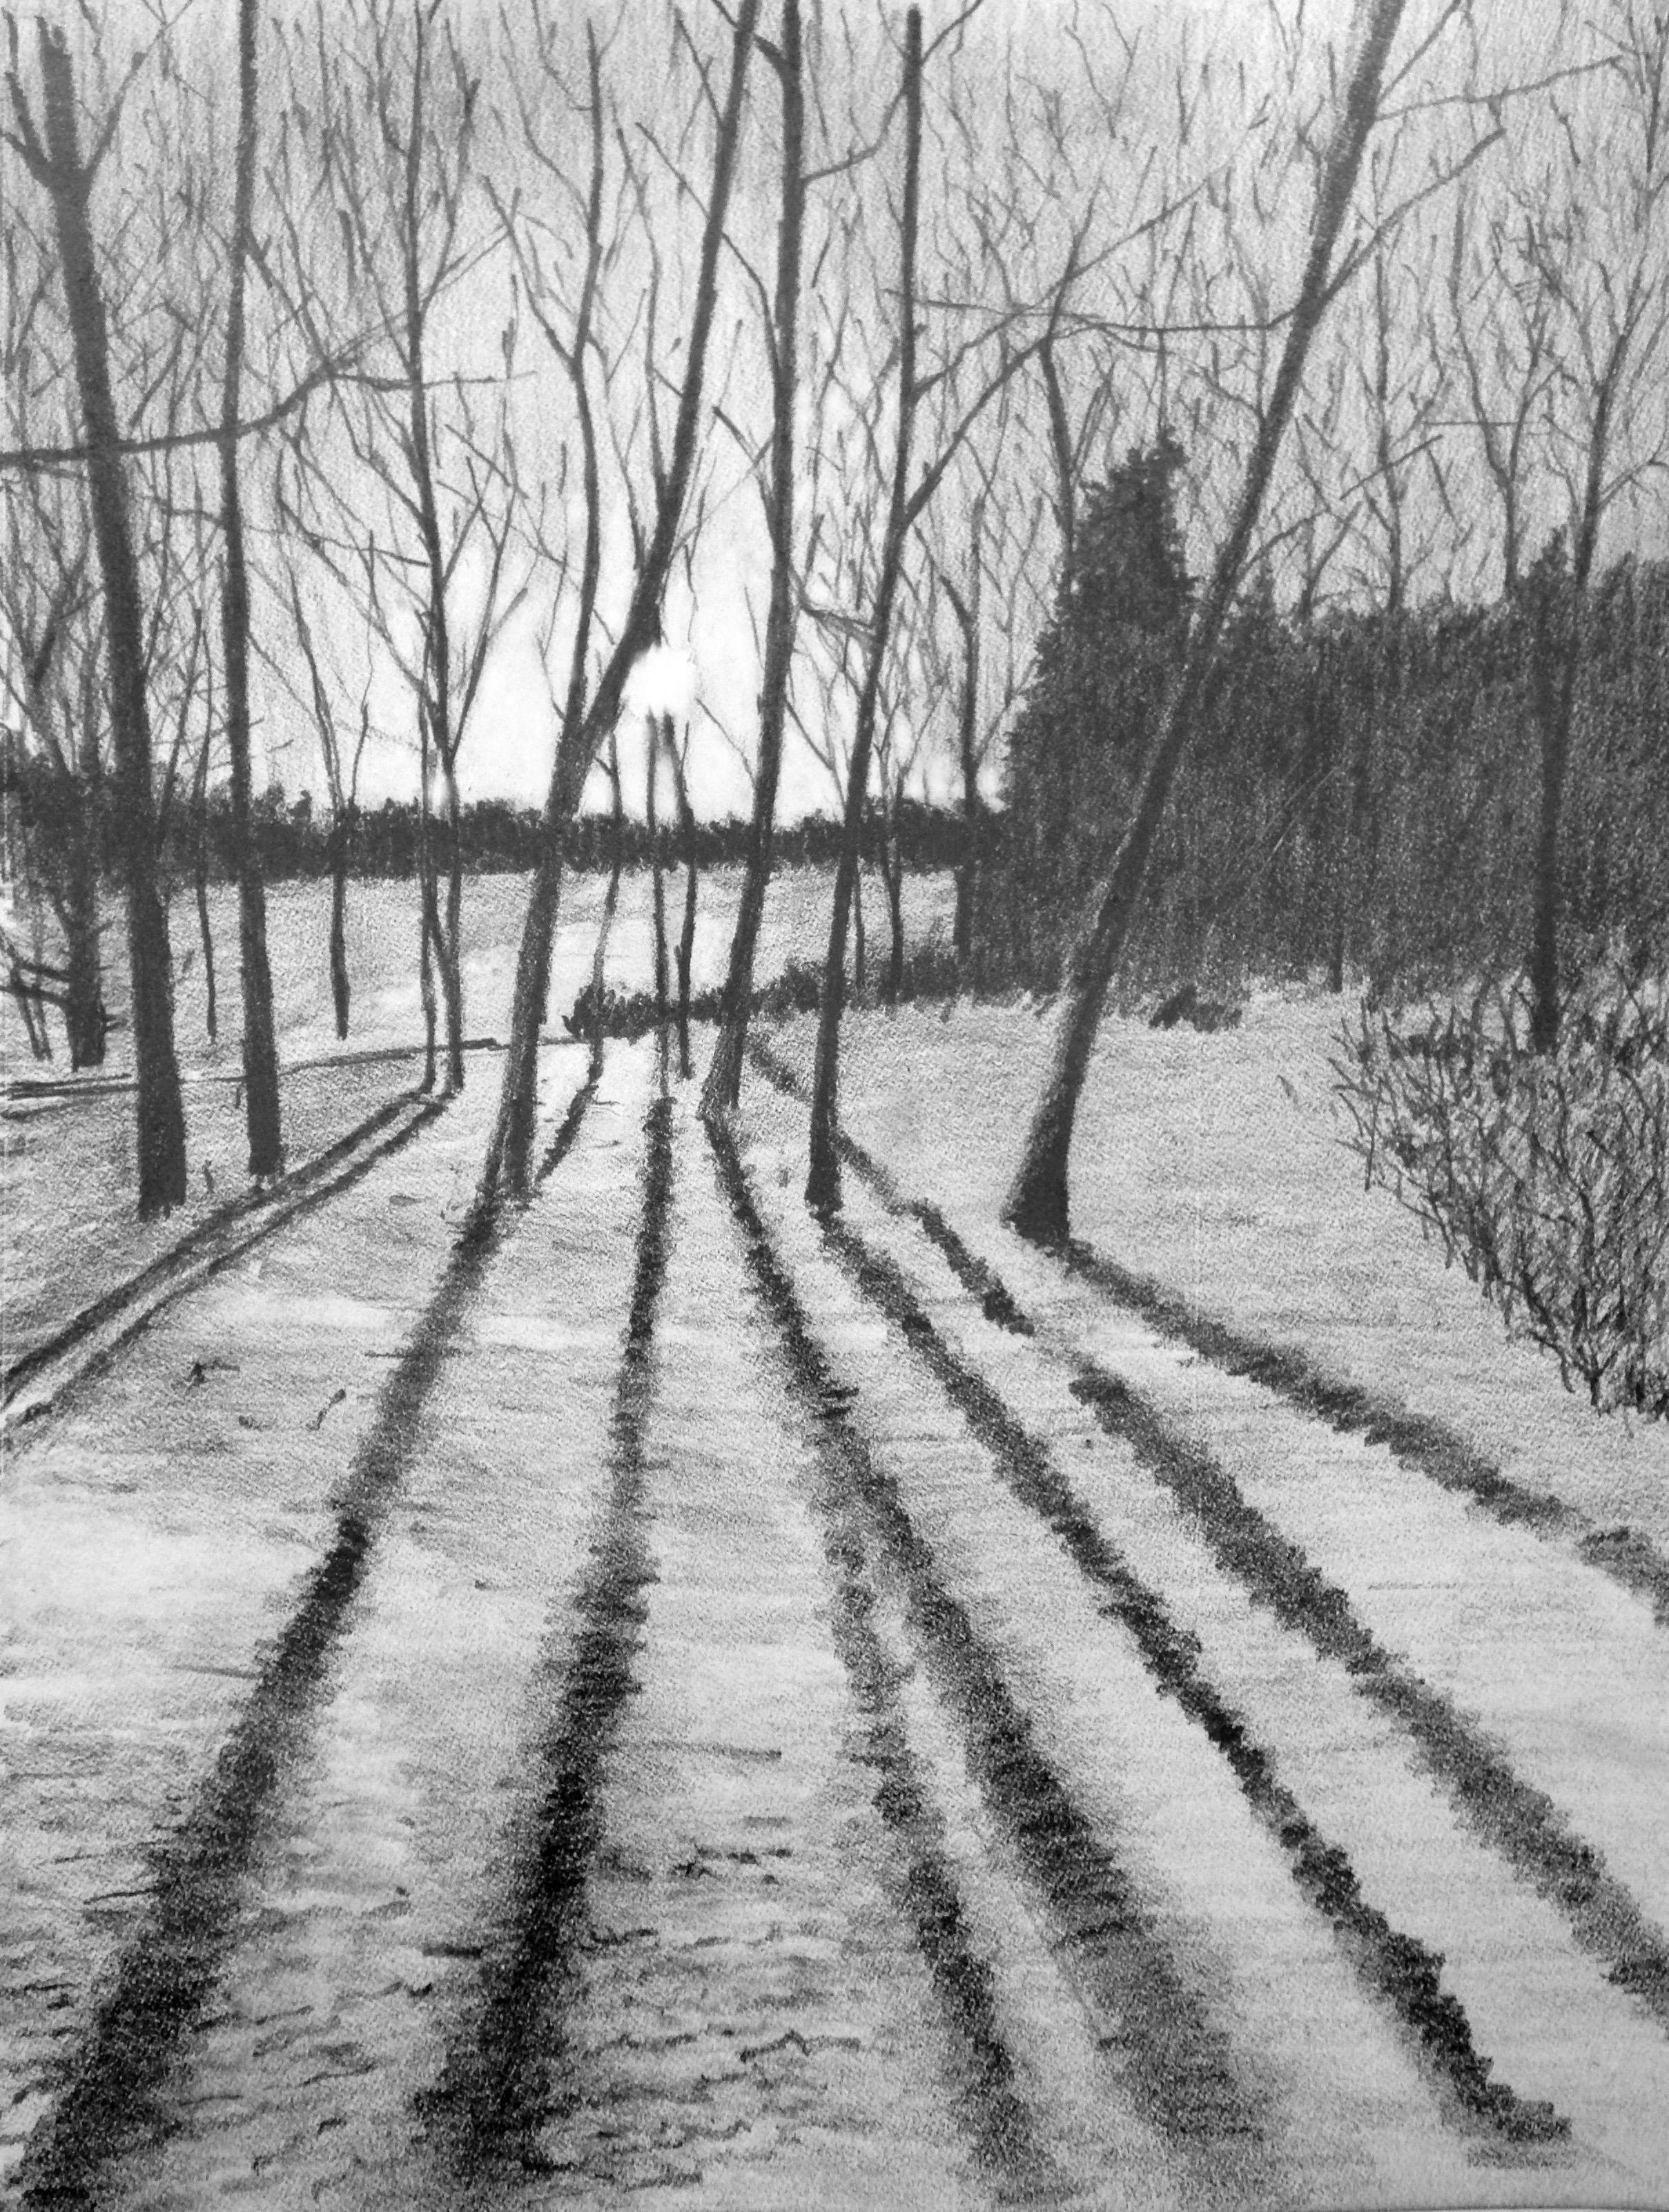 Benzie_Crystal Downs_Sunset_Tree_Shadows.12.13(2).jpg